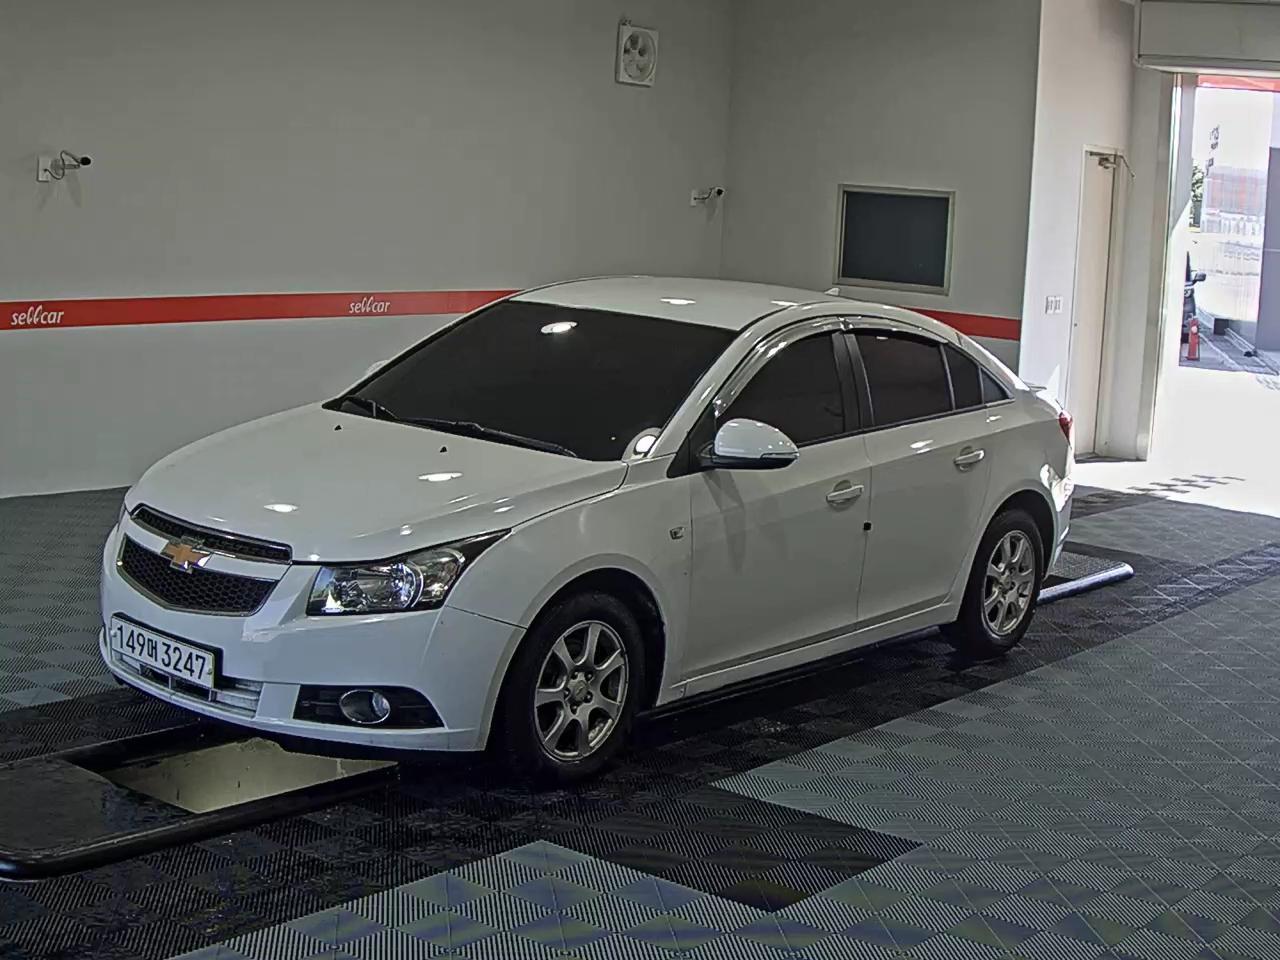 1602 Chevrolet GM Korea Cruze 10-14 years 2-0 LTZ